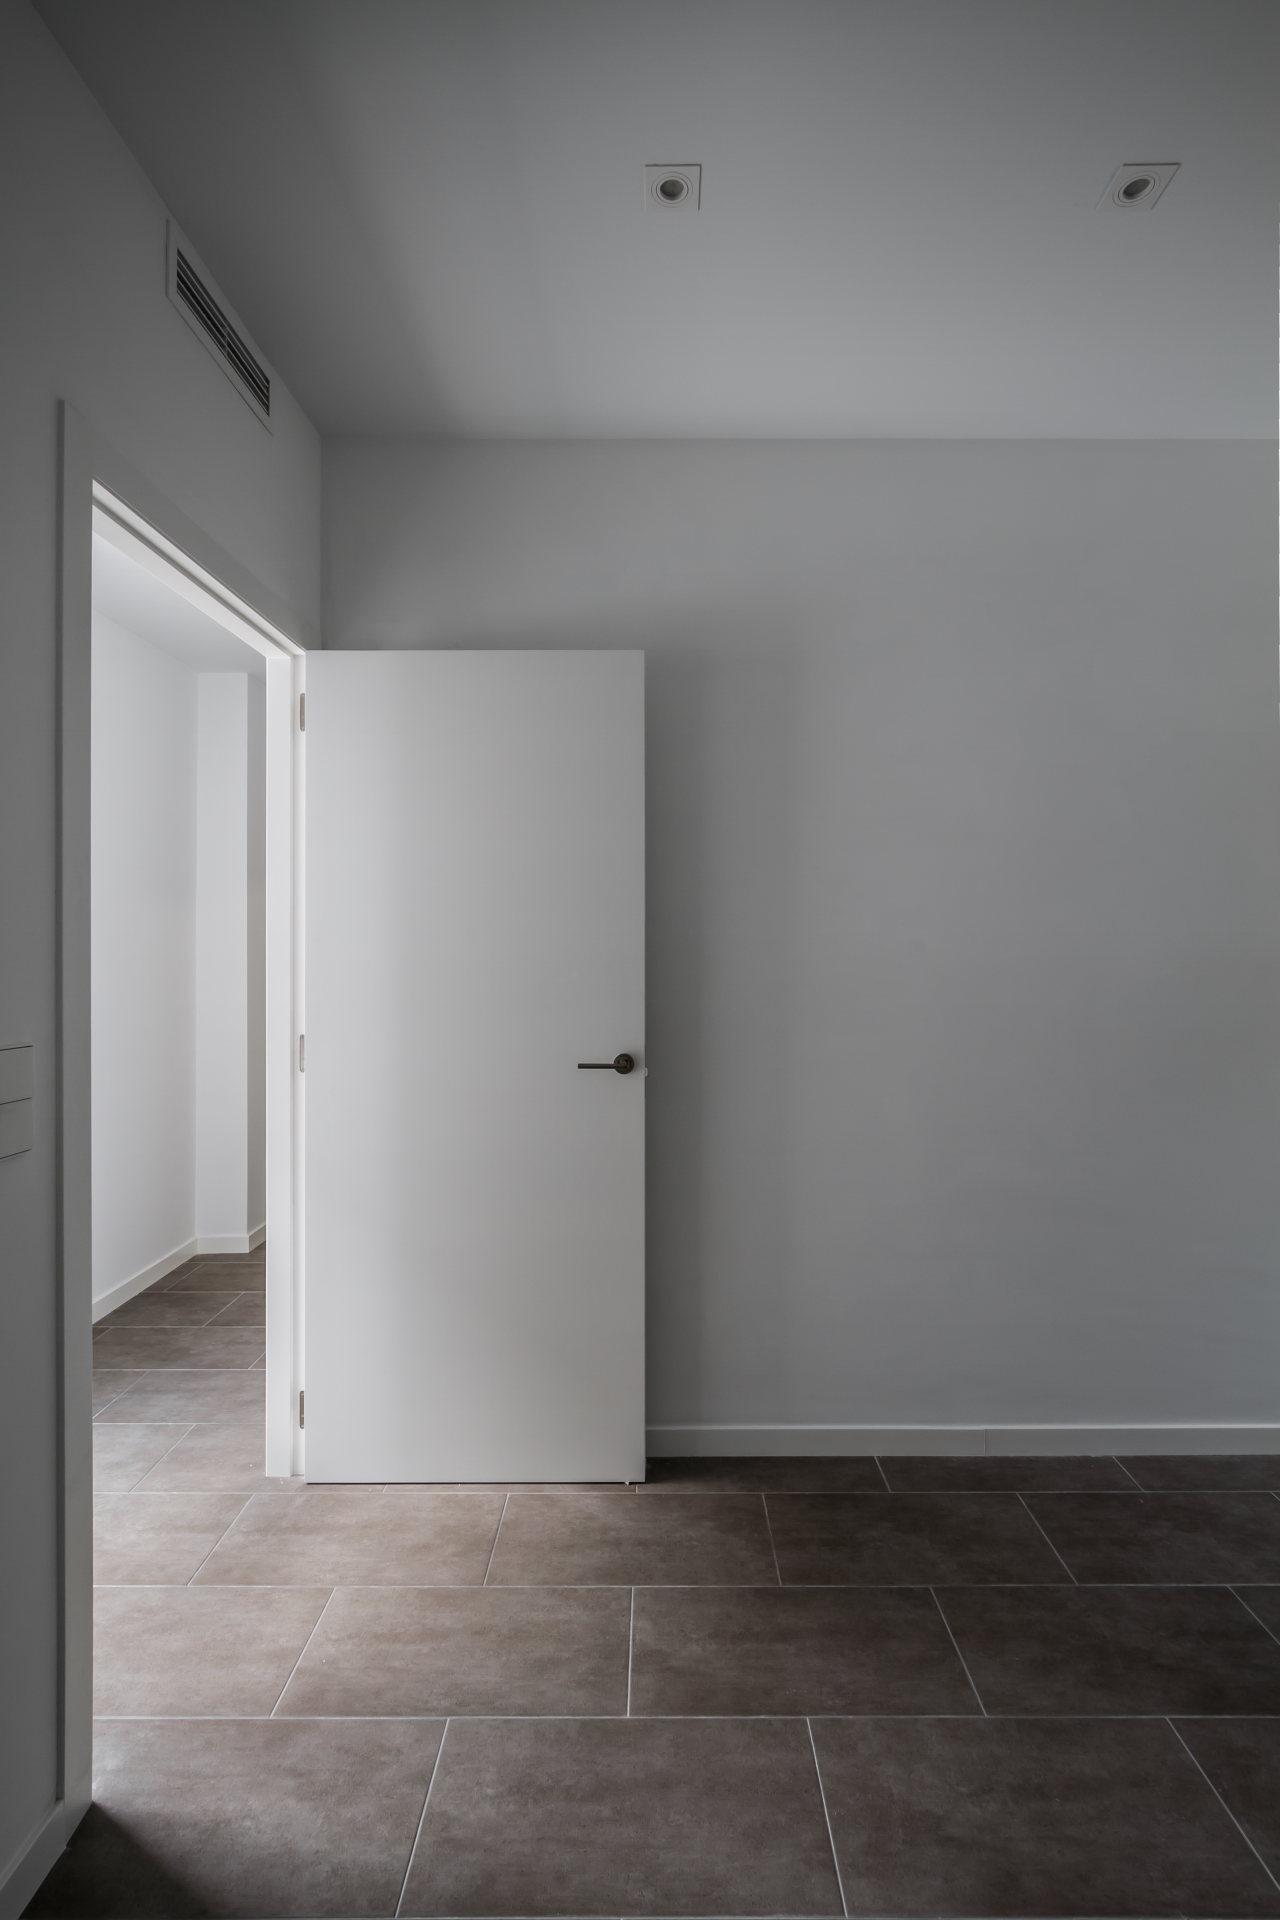 fotografia-arquitectura-valencia-german-cabo-viraje-museros (12)